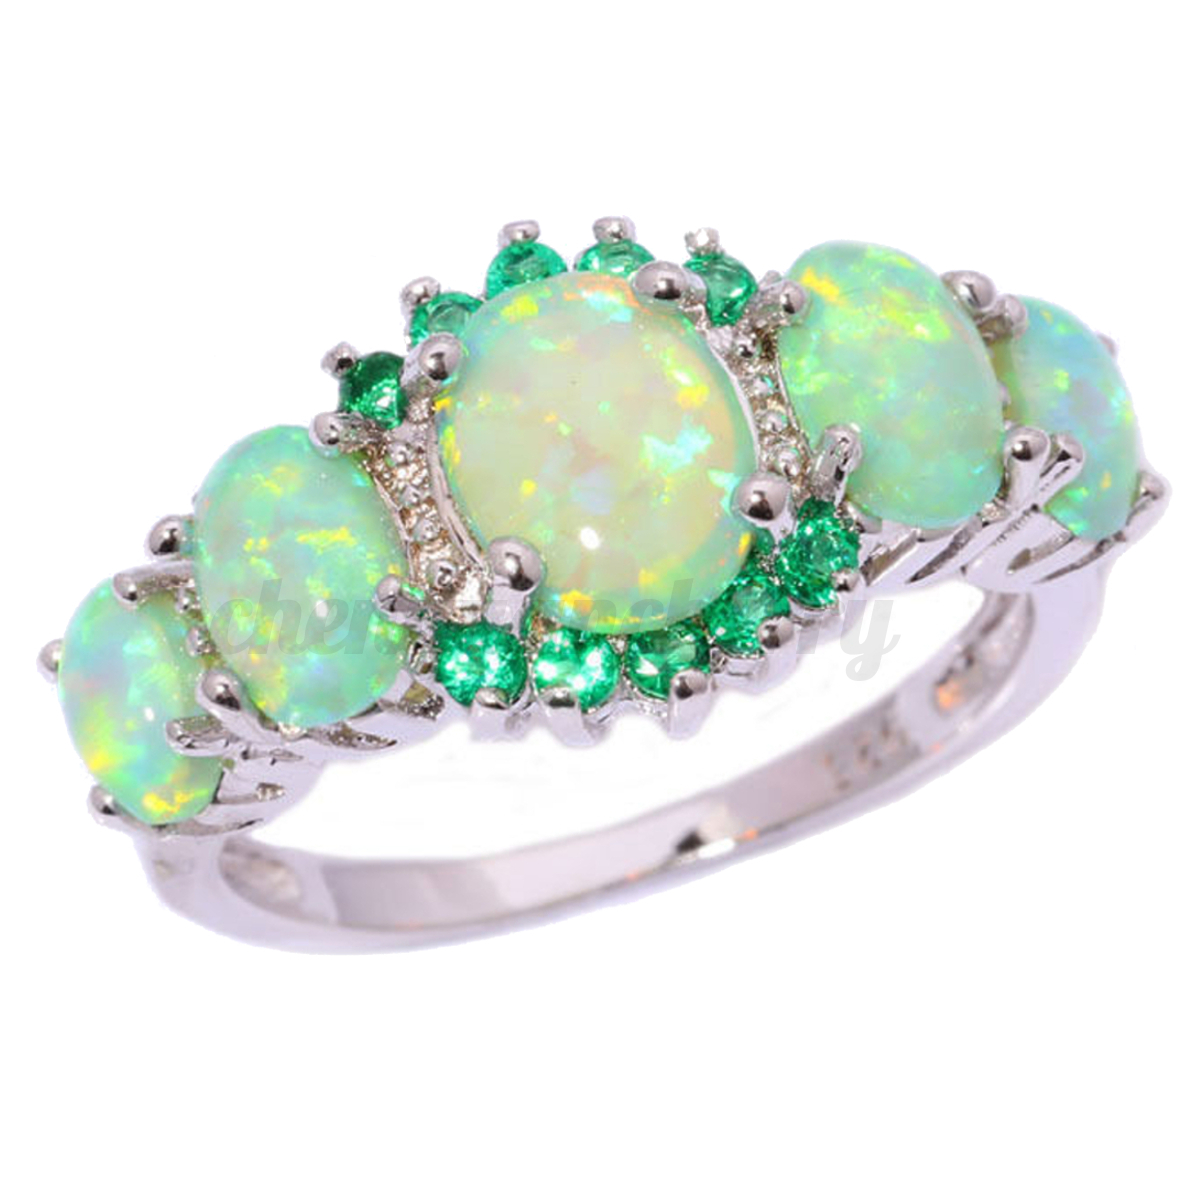 2019 year style- Opal fire wedding rings